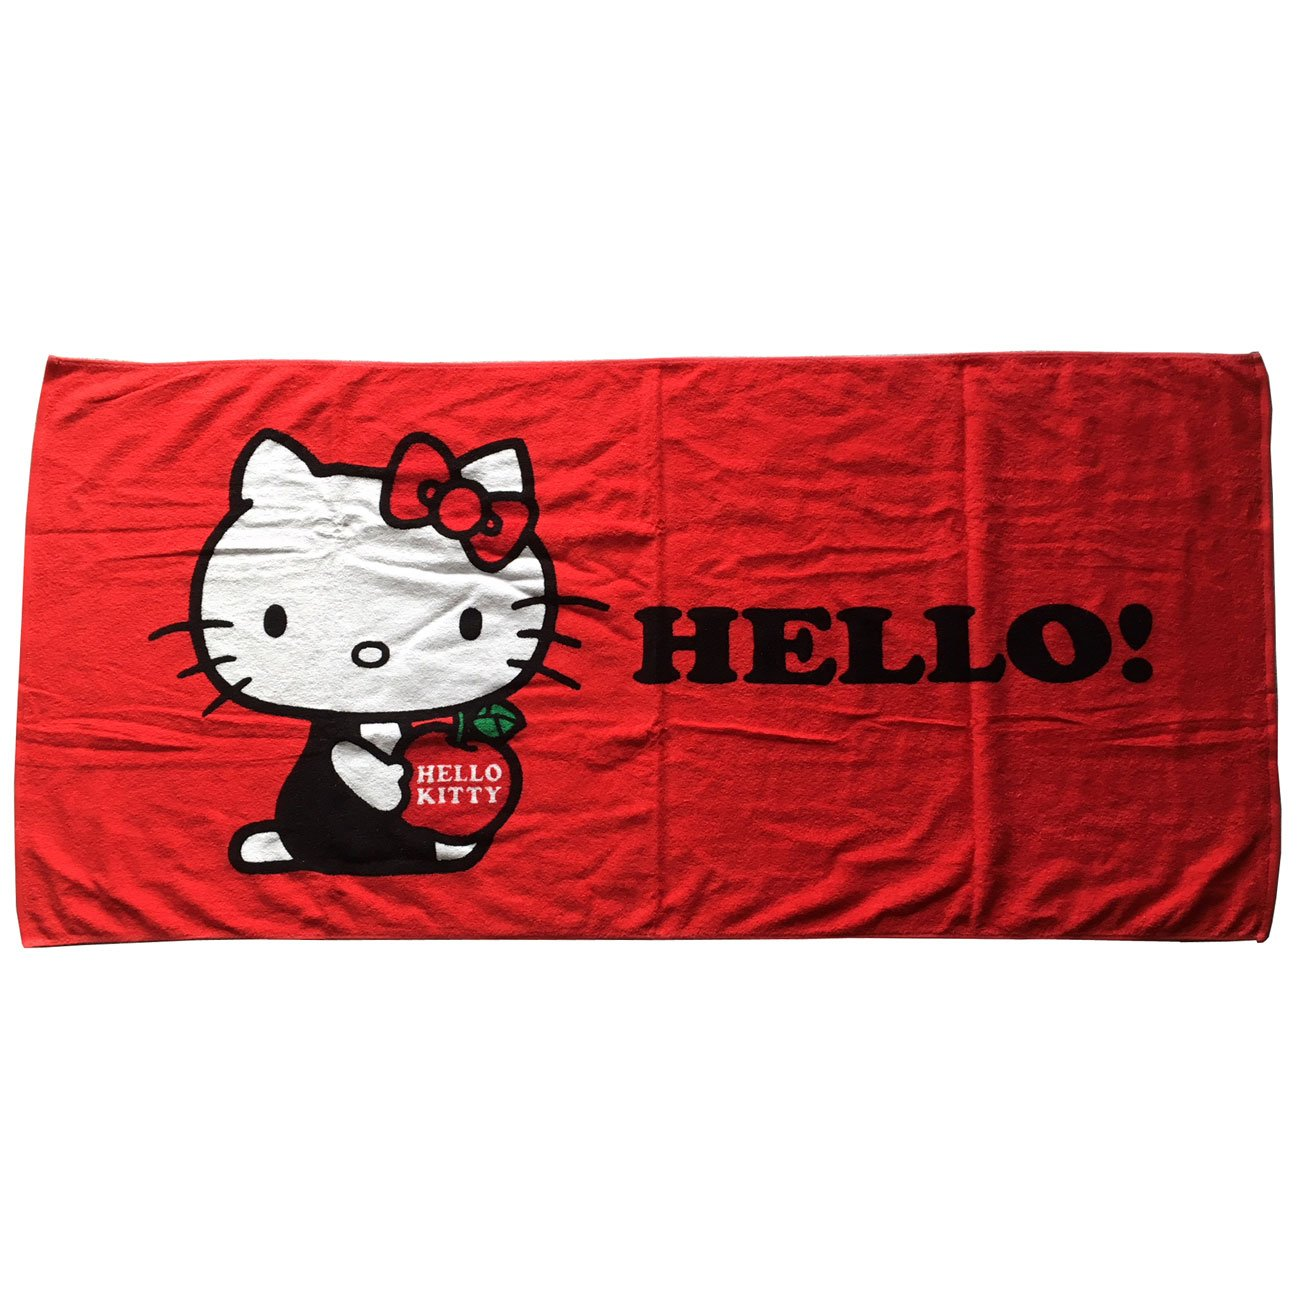 Hello Kitty Toalla Ducha Toalla Playa Fly Azul Original Sanrio